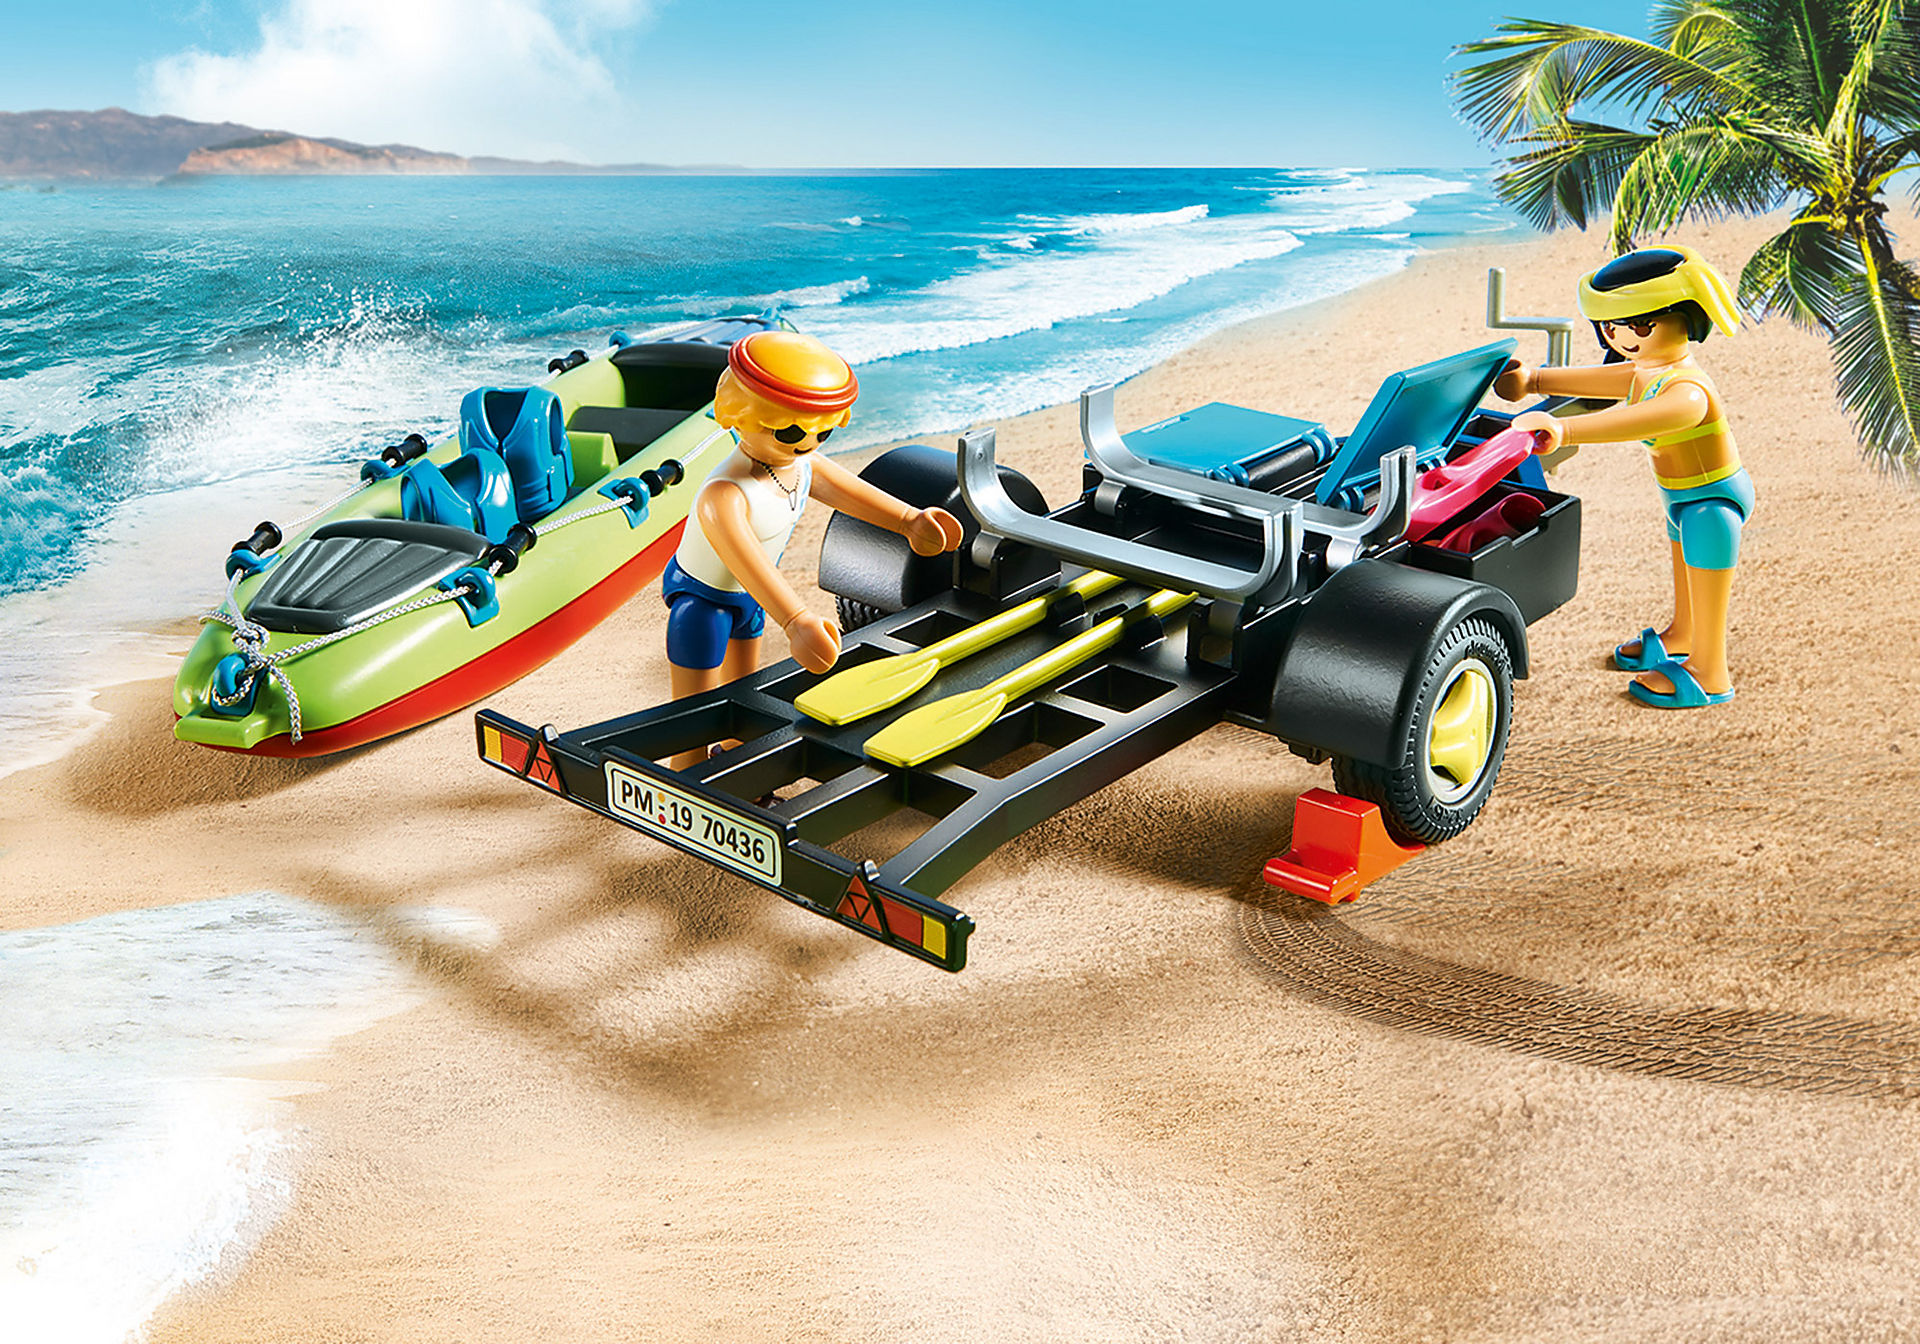 70436 Beach Car with Canoe zoom image5